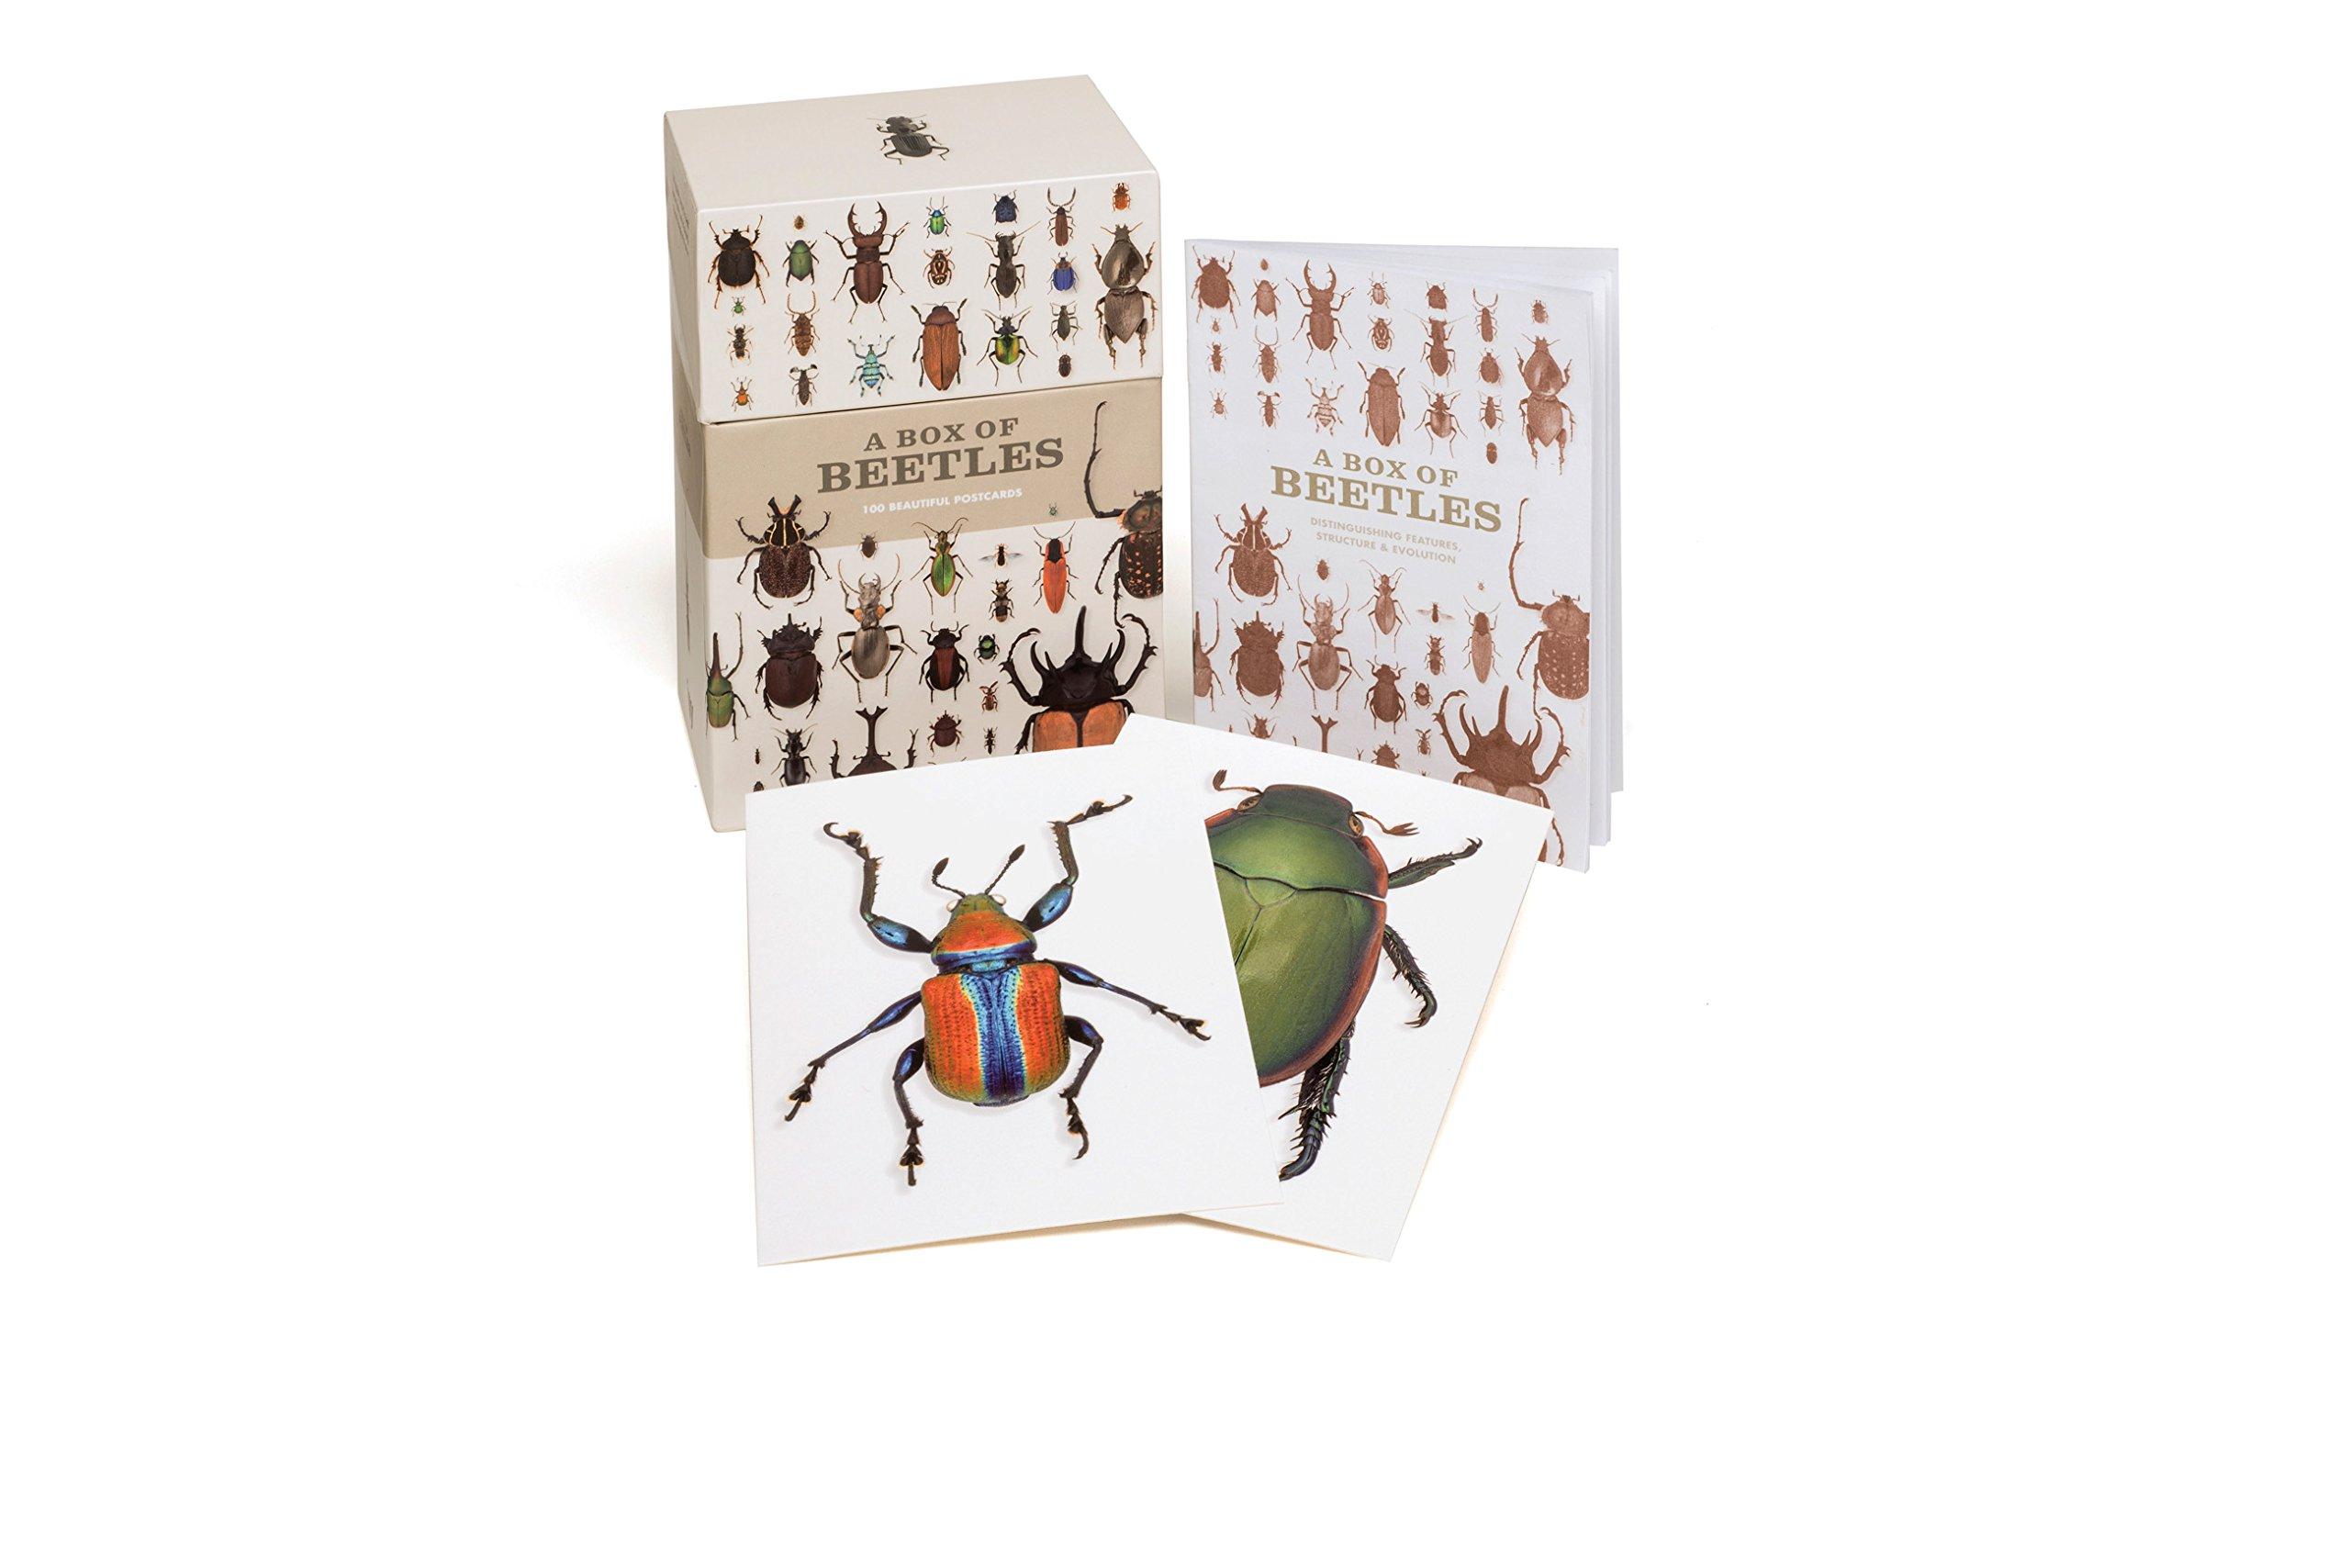 A Box of Beetles